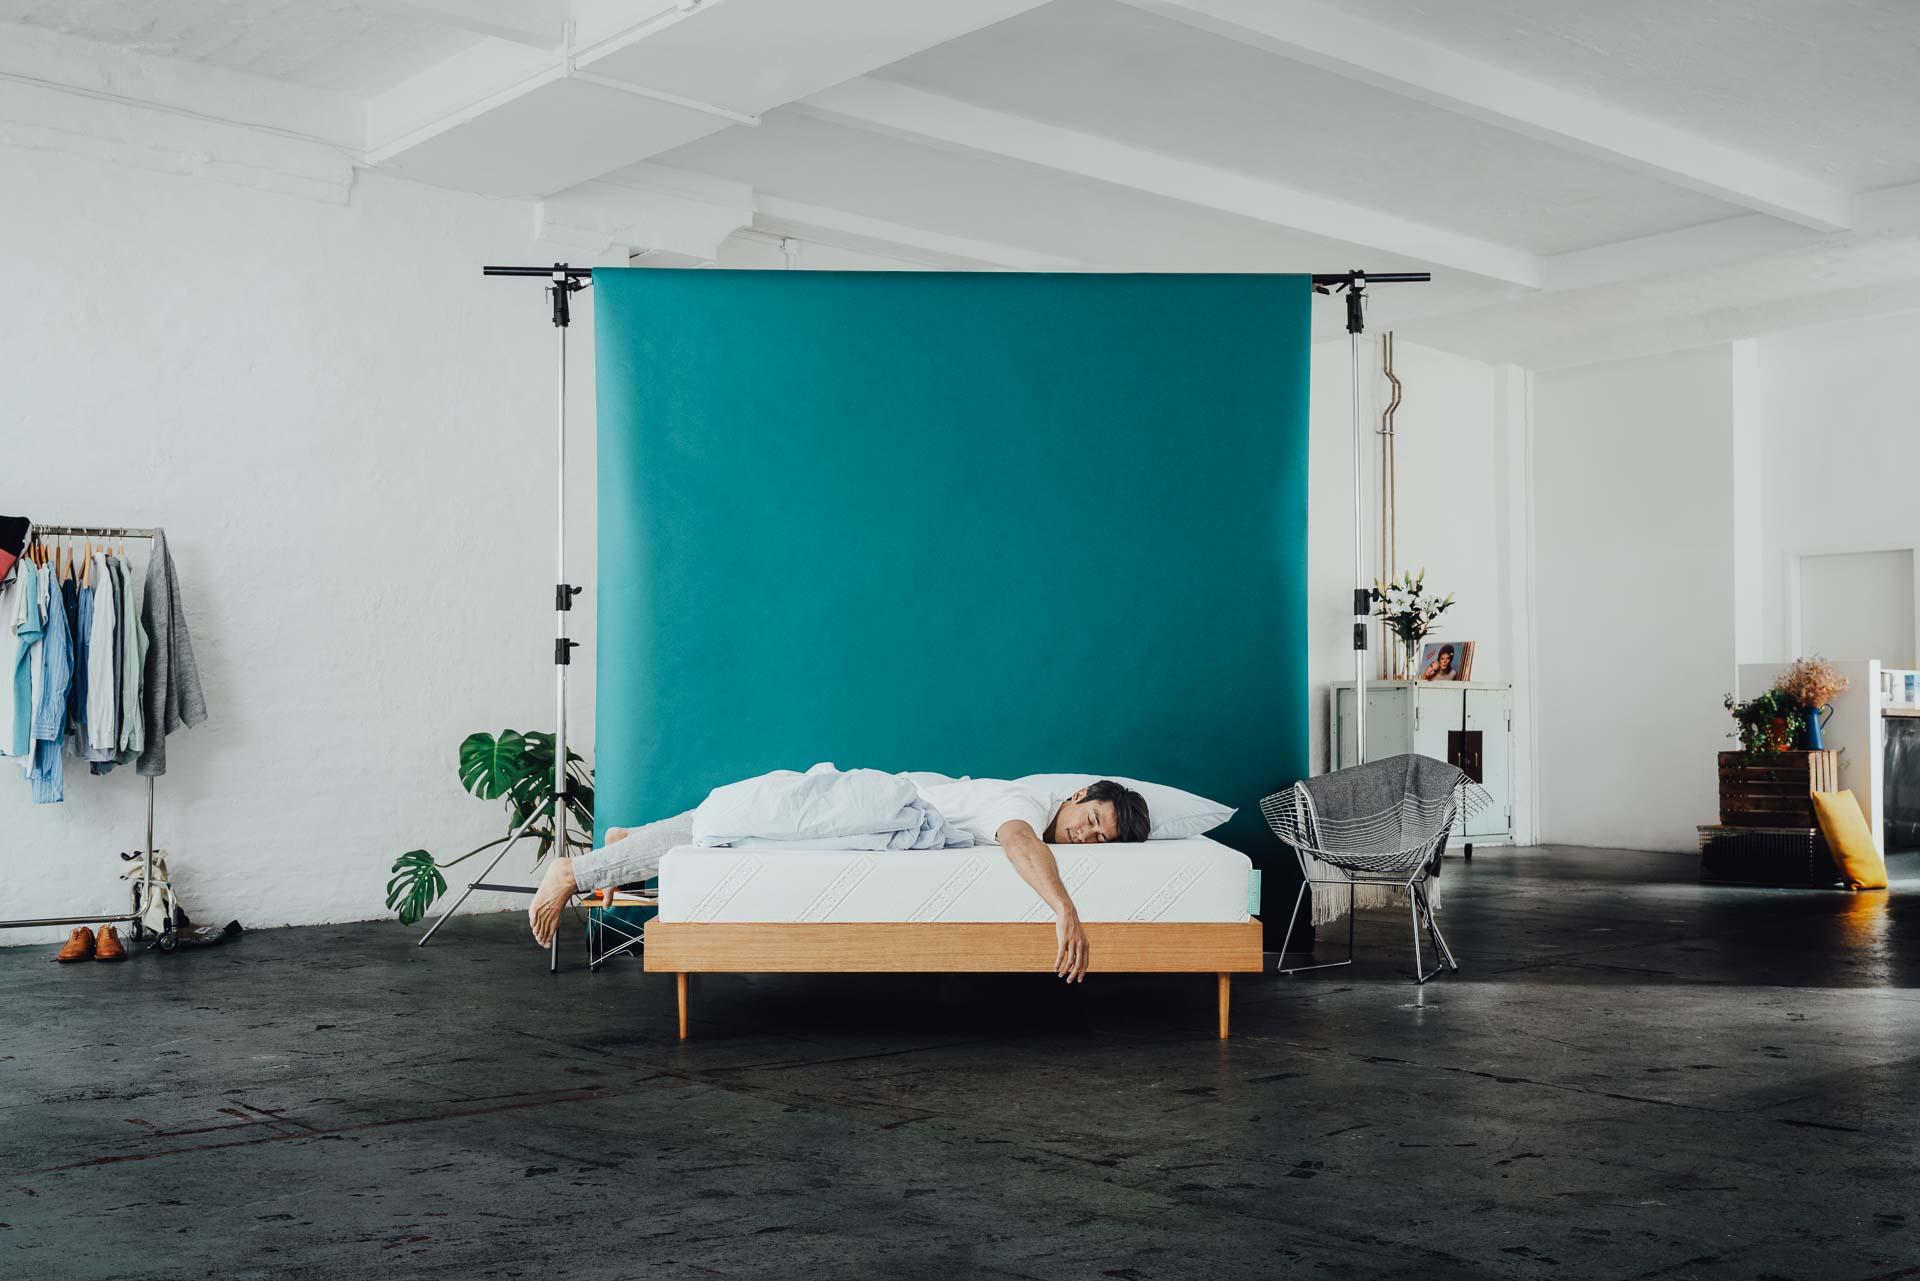 snooze project die ehrliche matratze. Black Bedroom Furniture Sets. Home Design Ideas